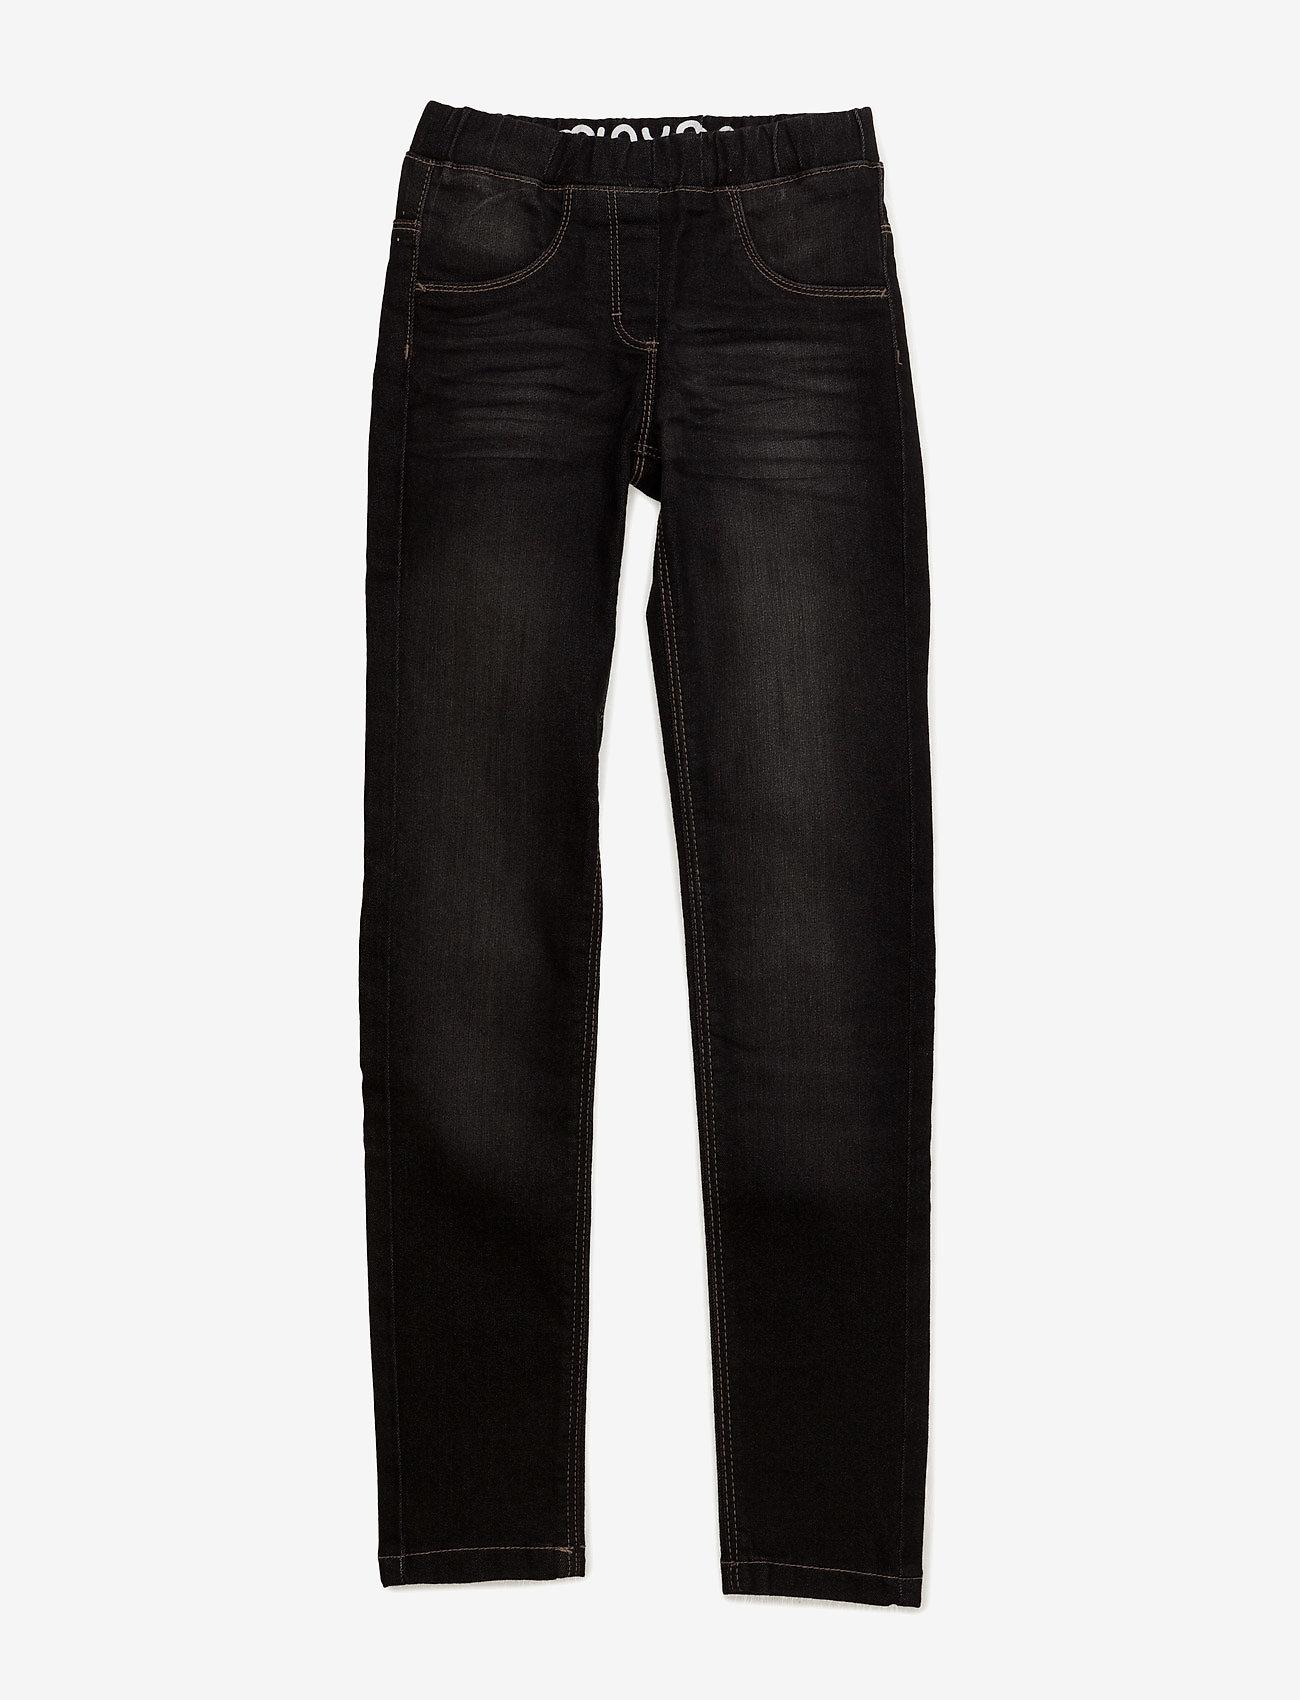 Minymo - Jeans girl - Slim fit - jeans - black - 0